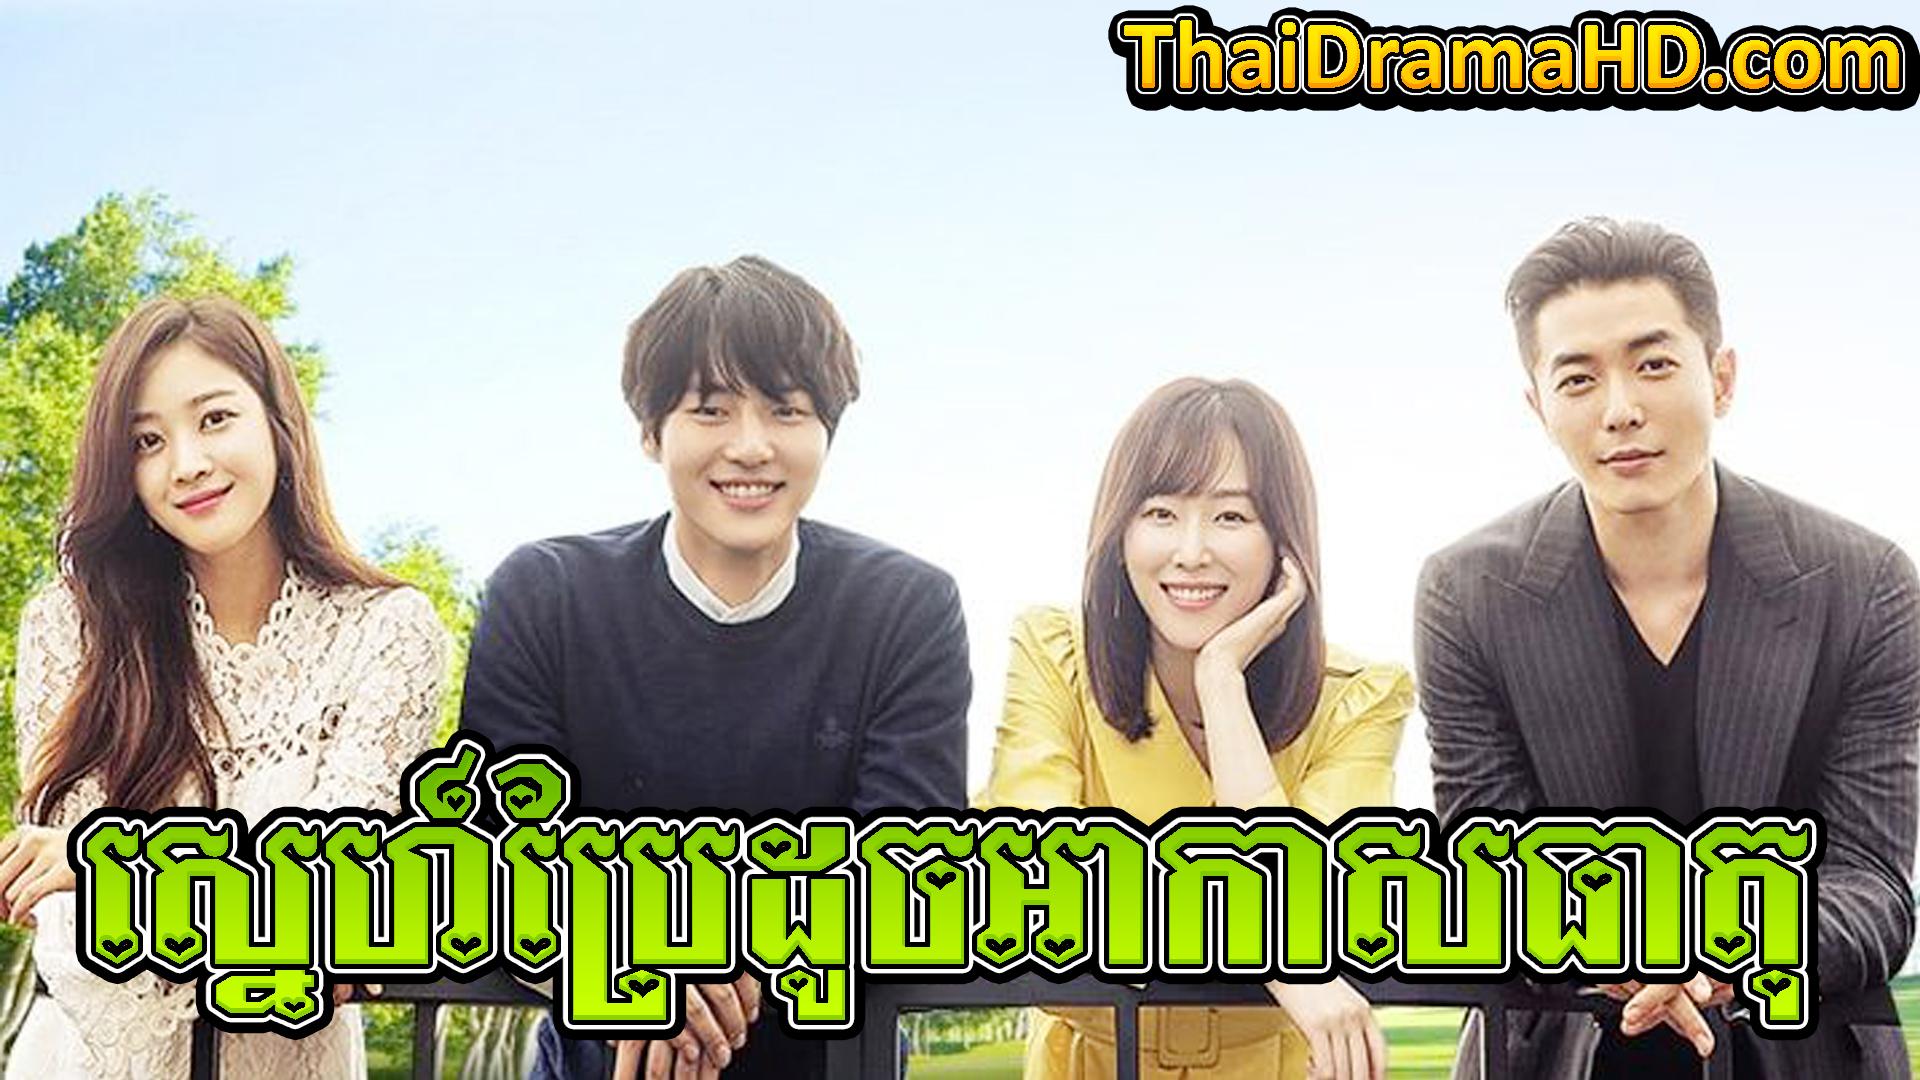 Sne Prae Doch Akastheat | Thai Drama | Khmer Movie | Phumikhmer | movie-khmer | video4khmer | khmotions | kolabkhmer | khmer drama | ksdrama | cookingtips | roscheat | khmertimeskh | khmerkomsan | phumi7 | merlkon | film2us | movie2kh | sweetdrama | khmercitylove | khreplay | tvb cambodia drama | ckh7 | srokthai | phumimedia | phumi8 | khmer avenue | khmer search | Soyo | khmerfans